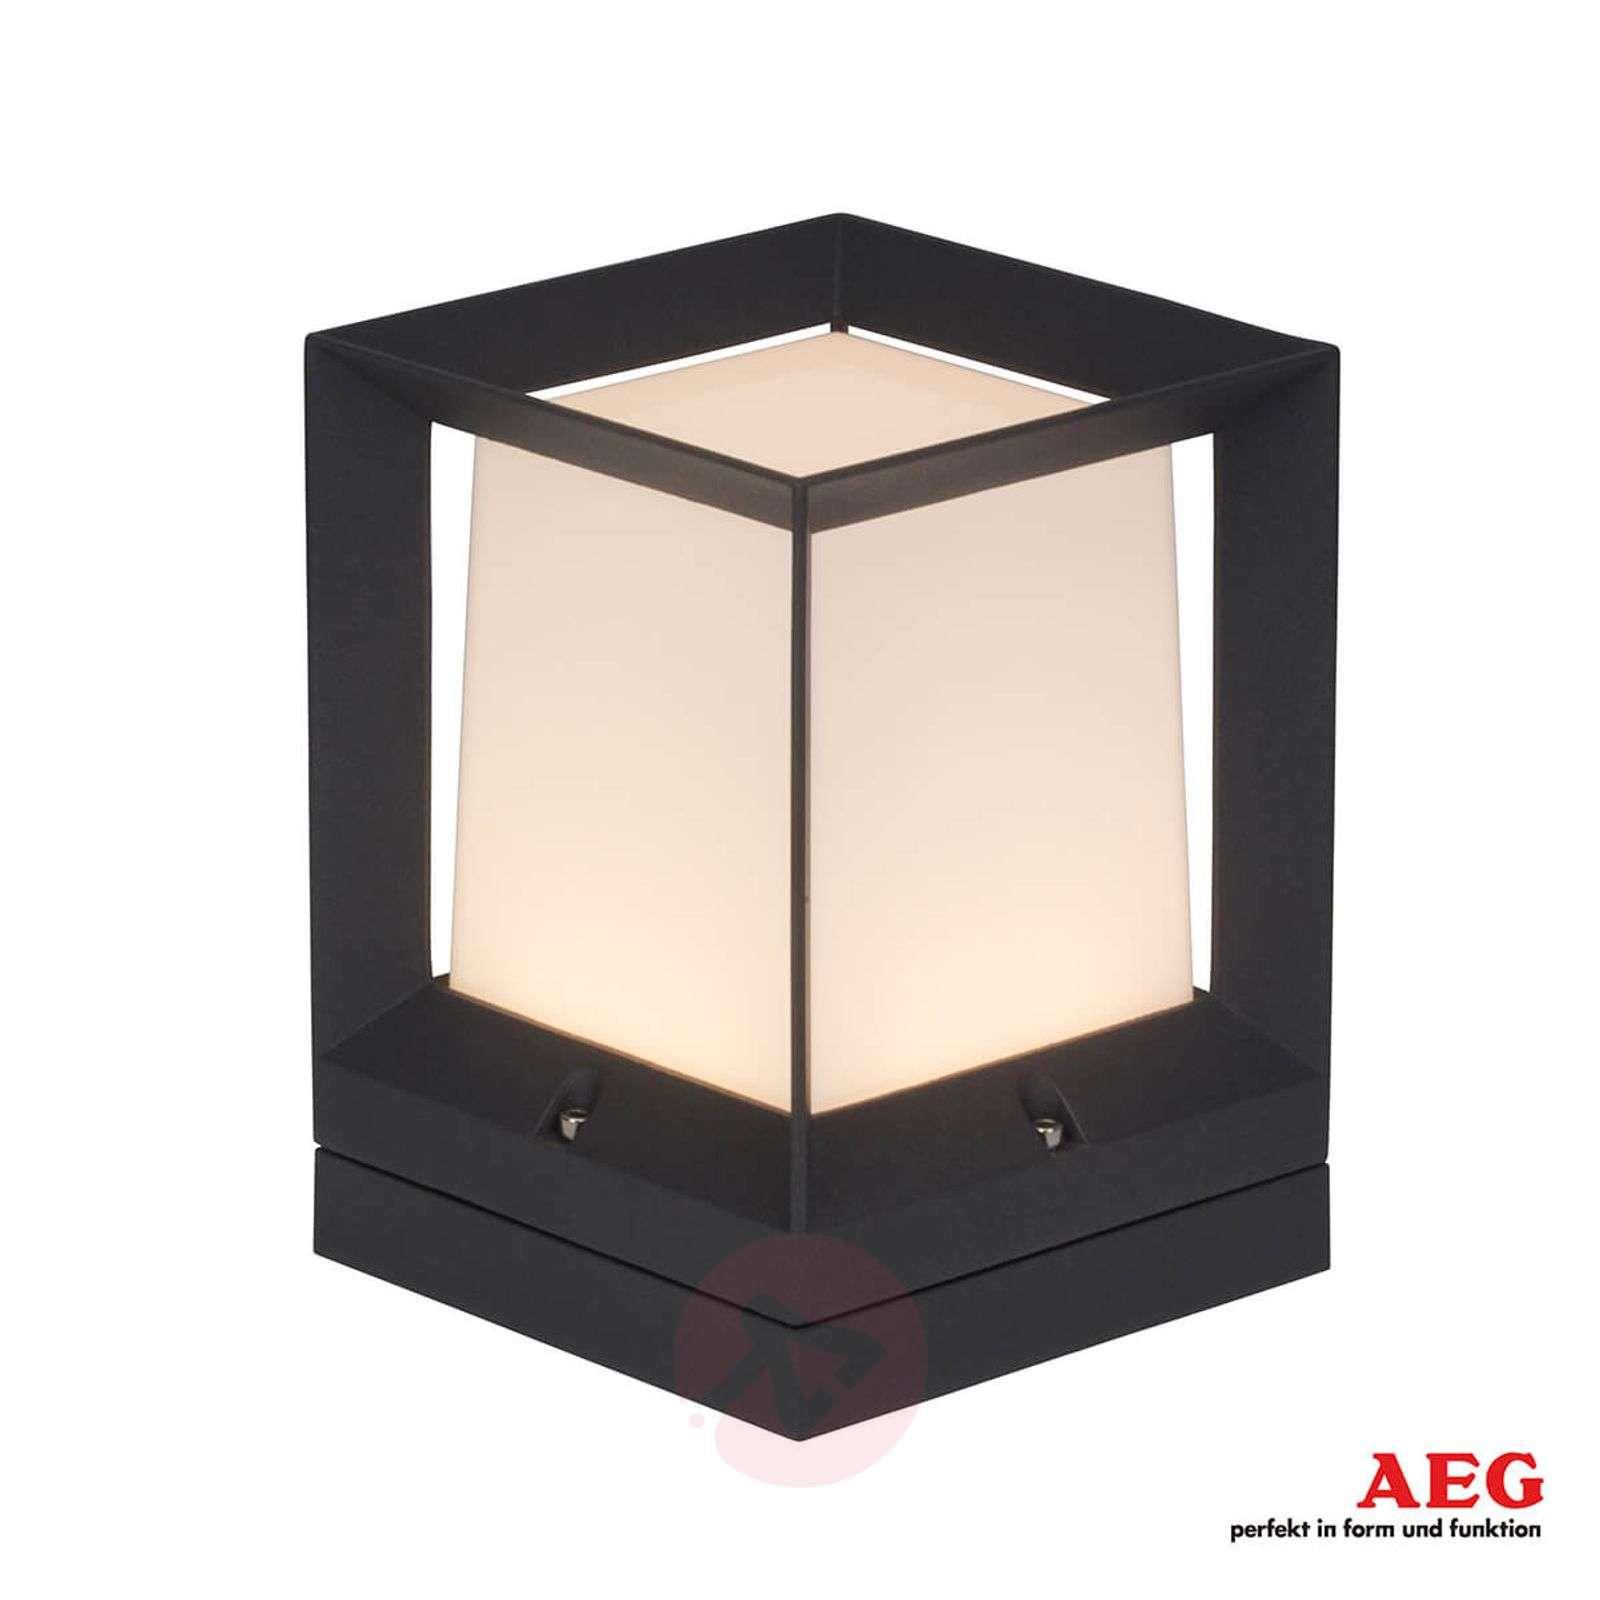 Rectangular Kubus LED pillar light-3057113-01